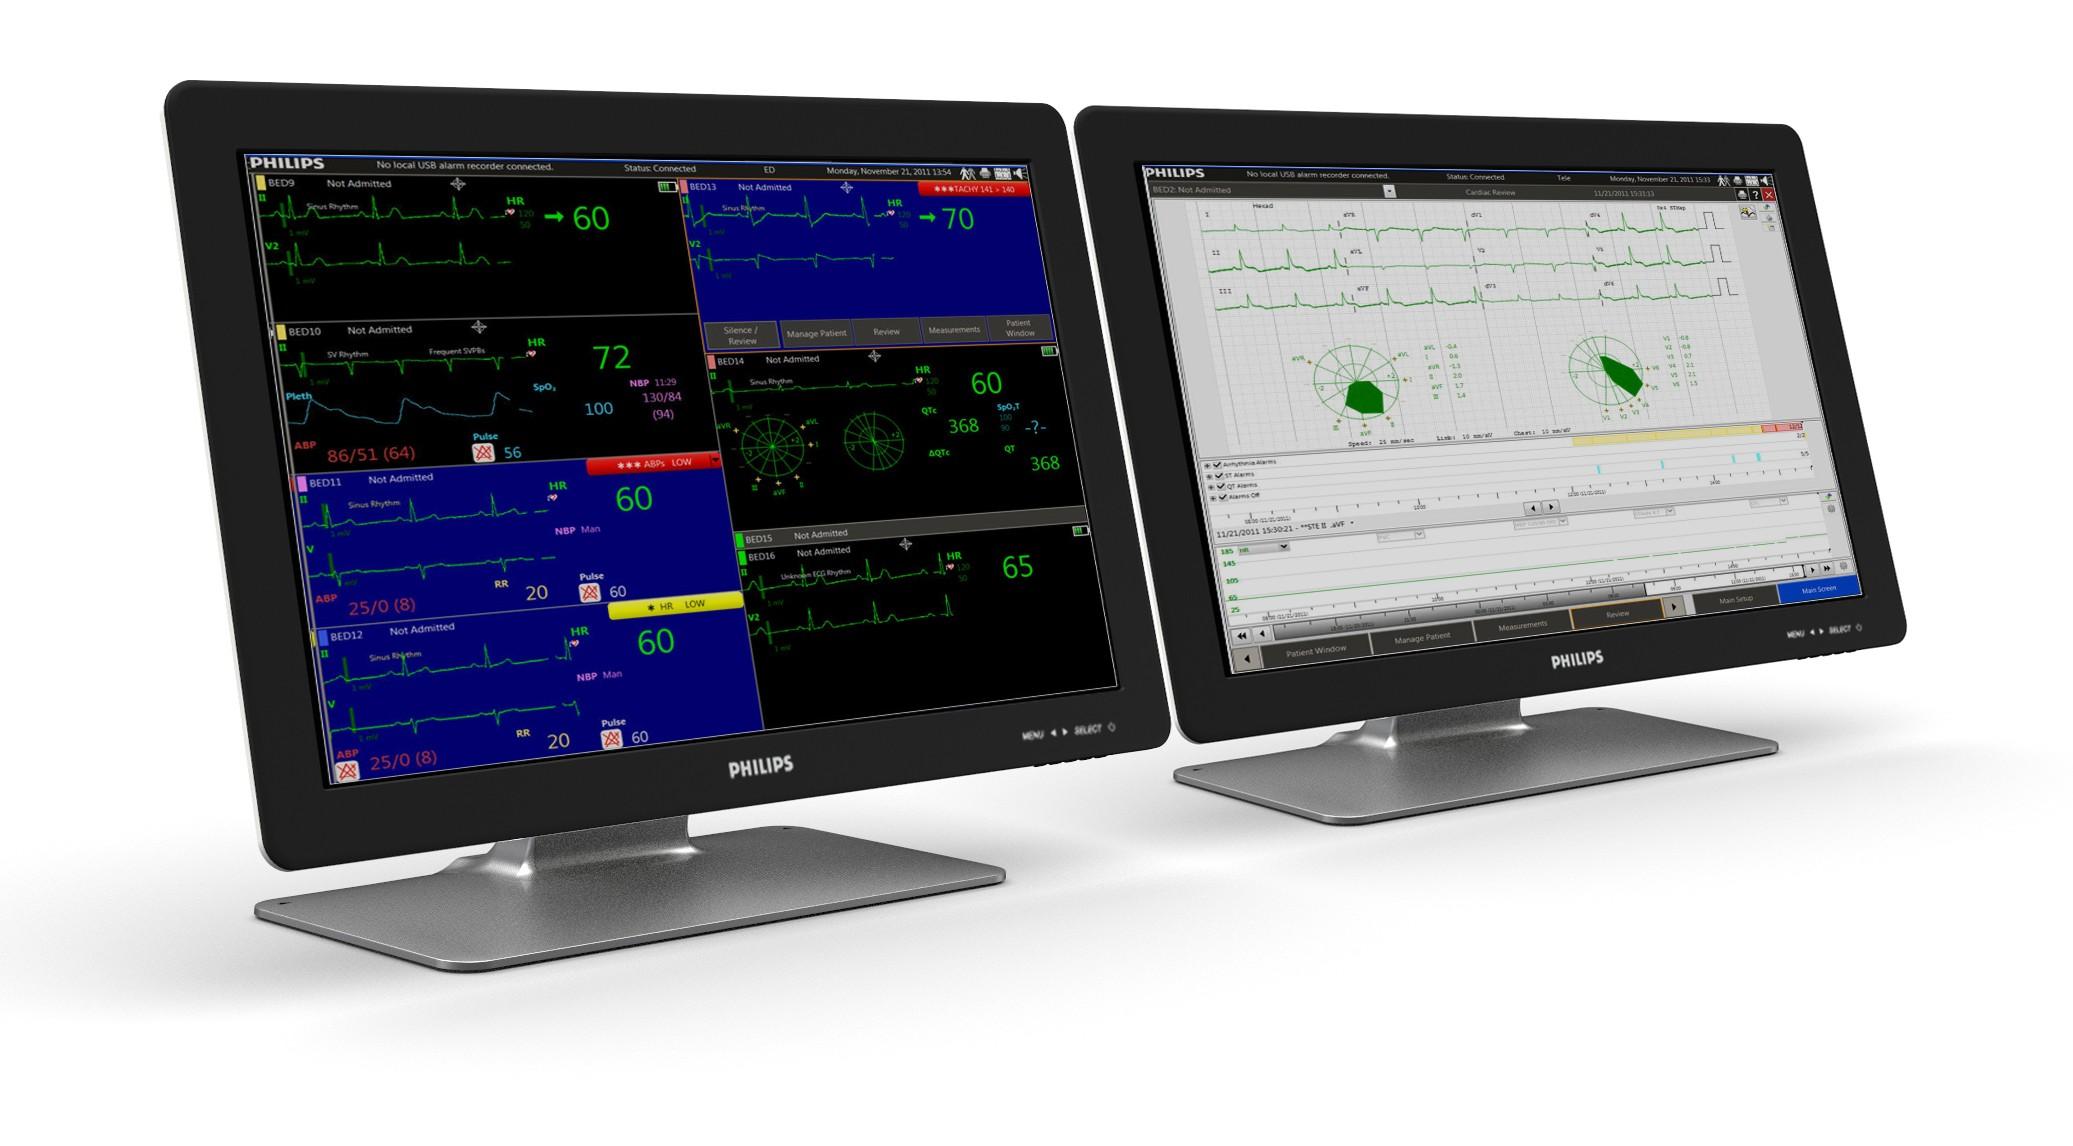 Philips IntelliVue MX40 / Tragbarer Telemetrie